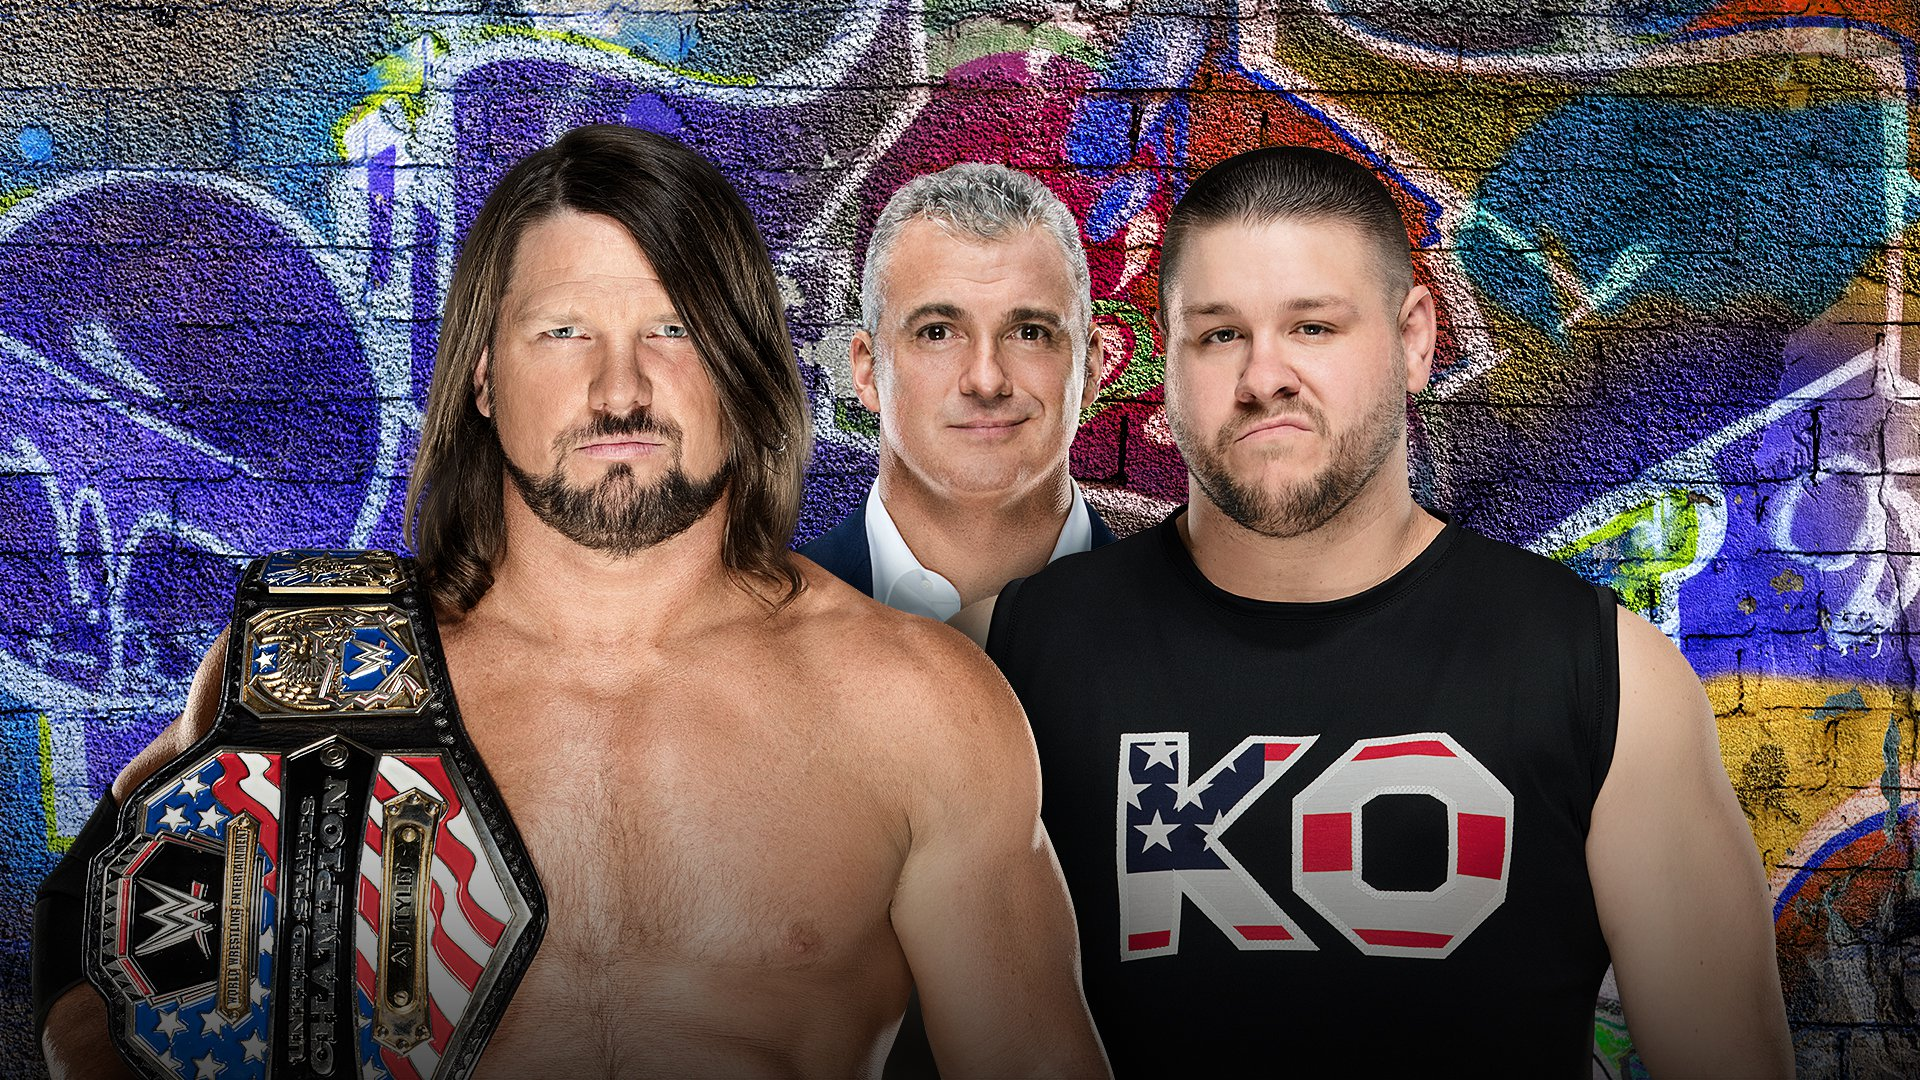 WWE SummerSlam 2017: AJ Styles vs. Kevin Owens